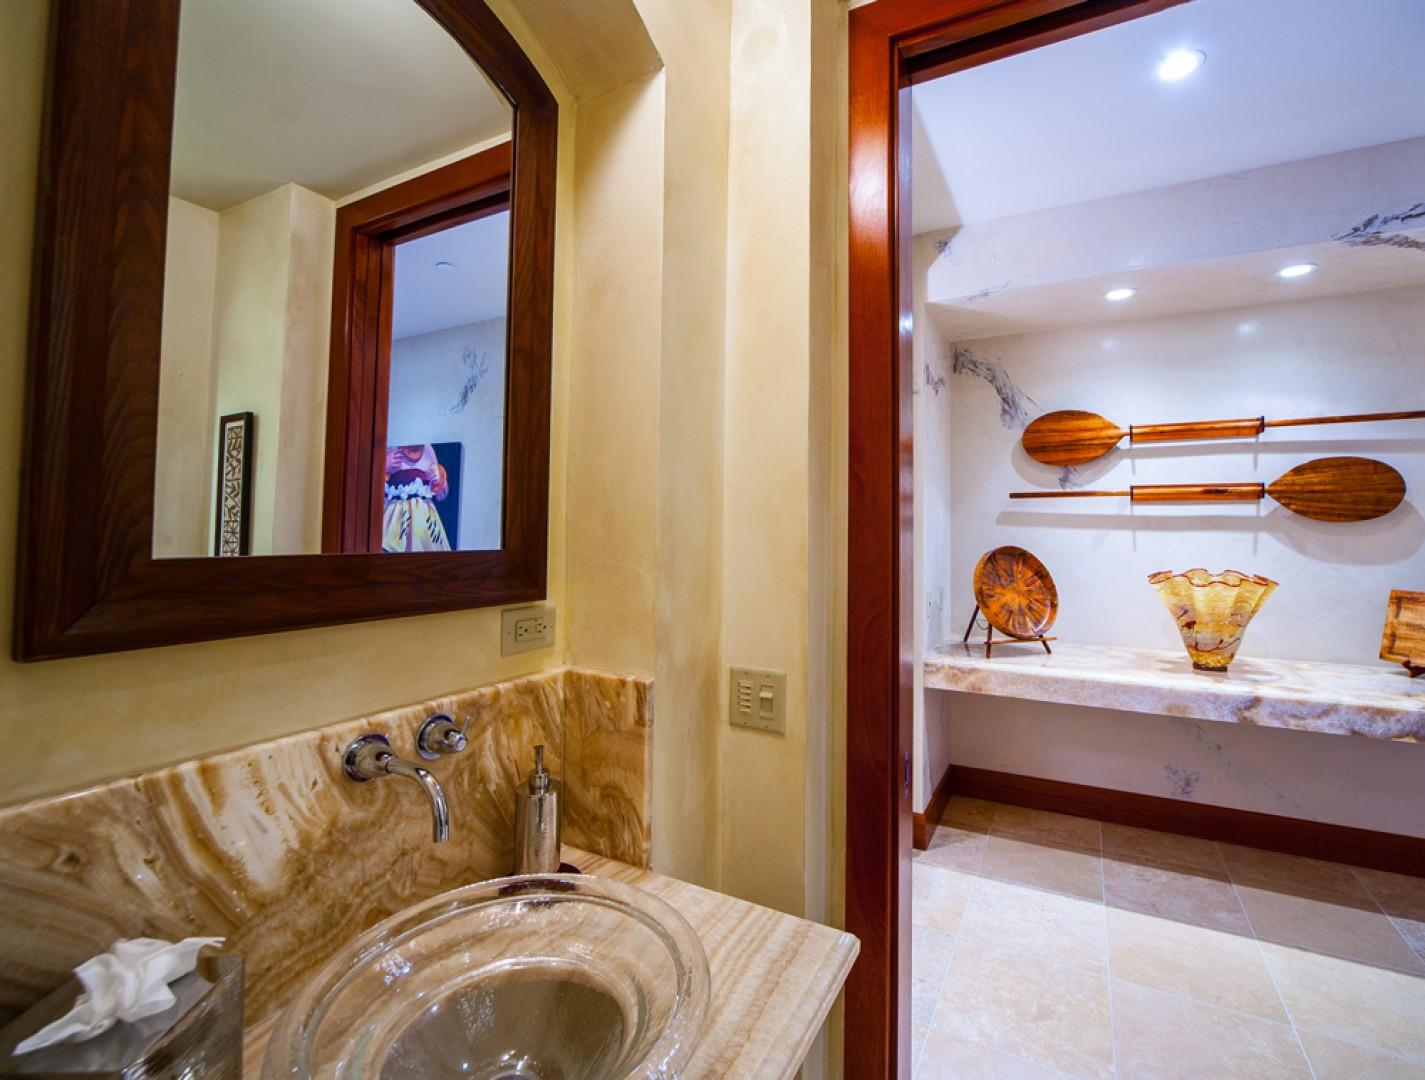 Powder Bath In Hallway with Glass Sink, Onyx Vanity, Marble Floors